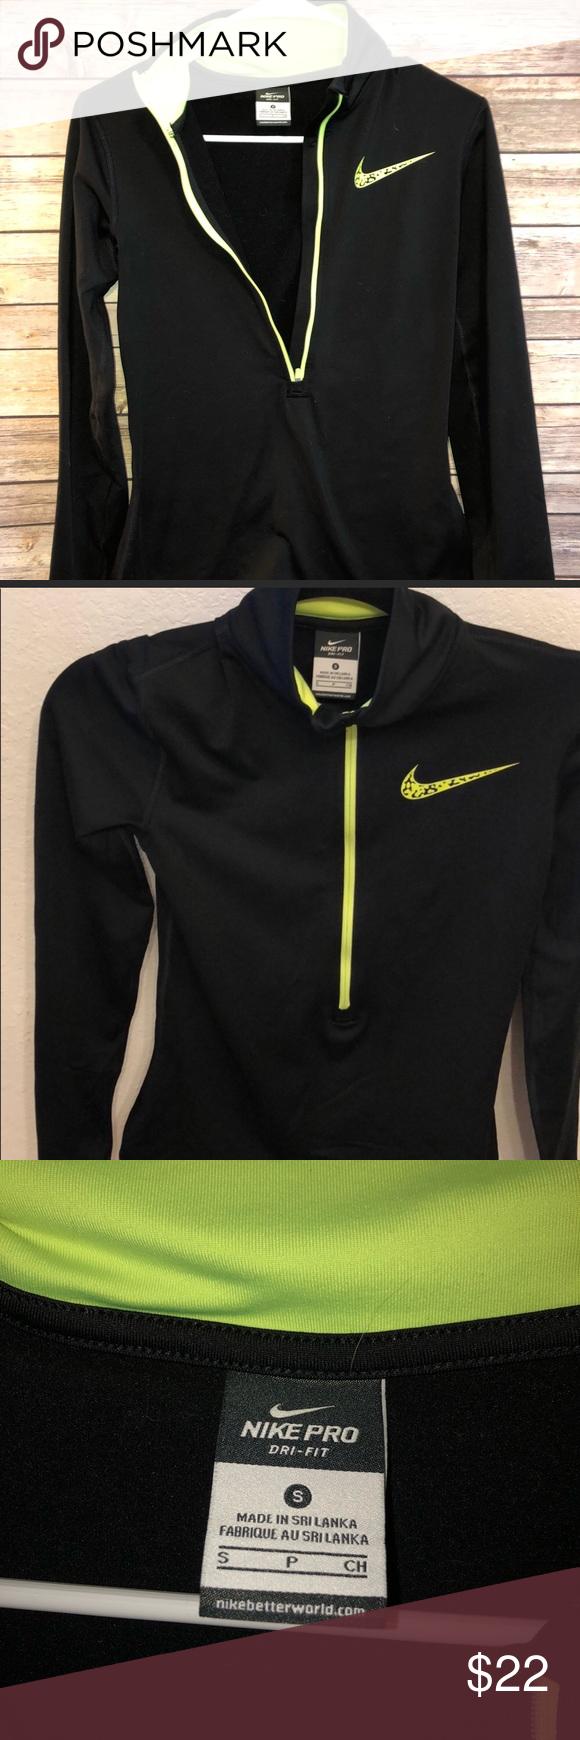 Nike Pro Dri Fit Sweatshirt Workout Sweatshirt Sweatshirts Dri Fit